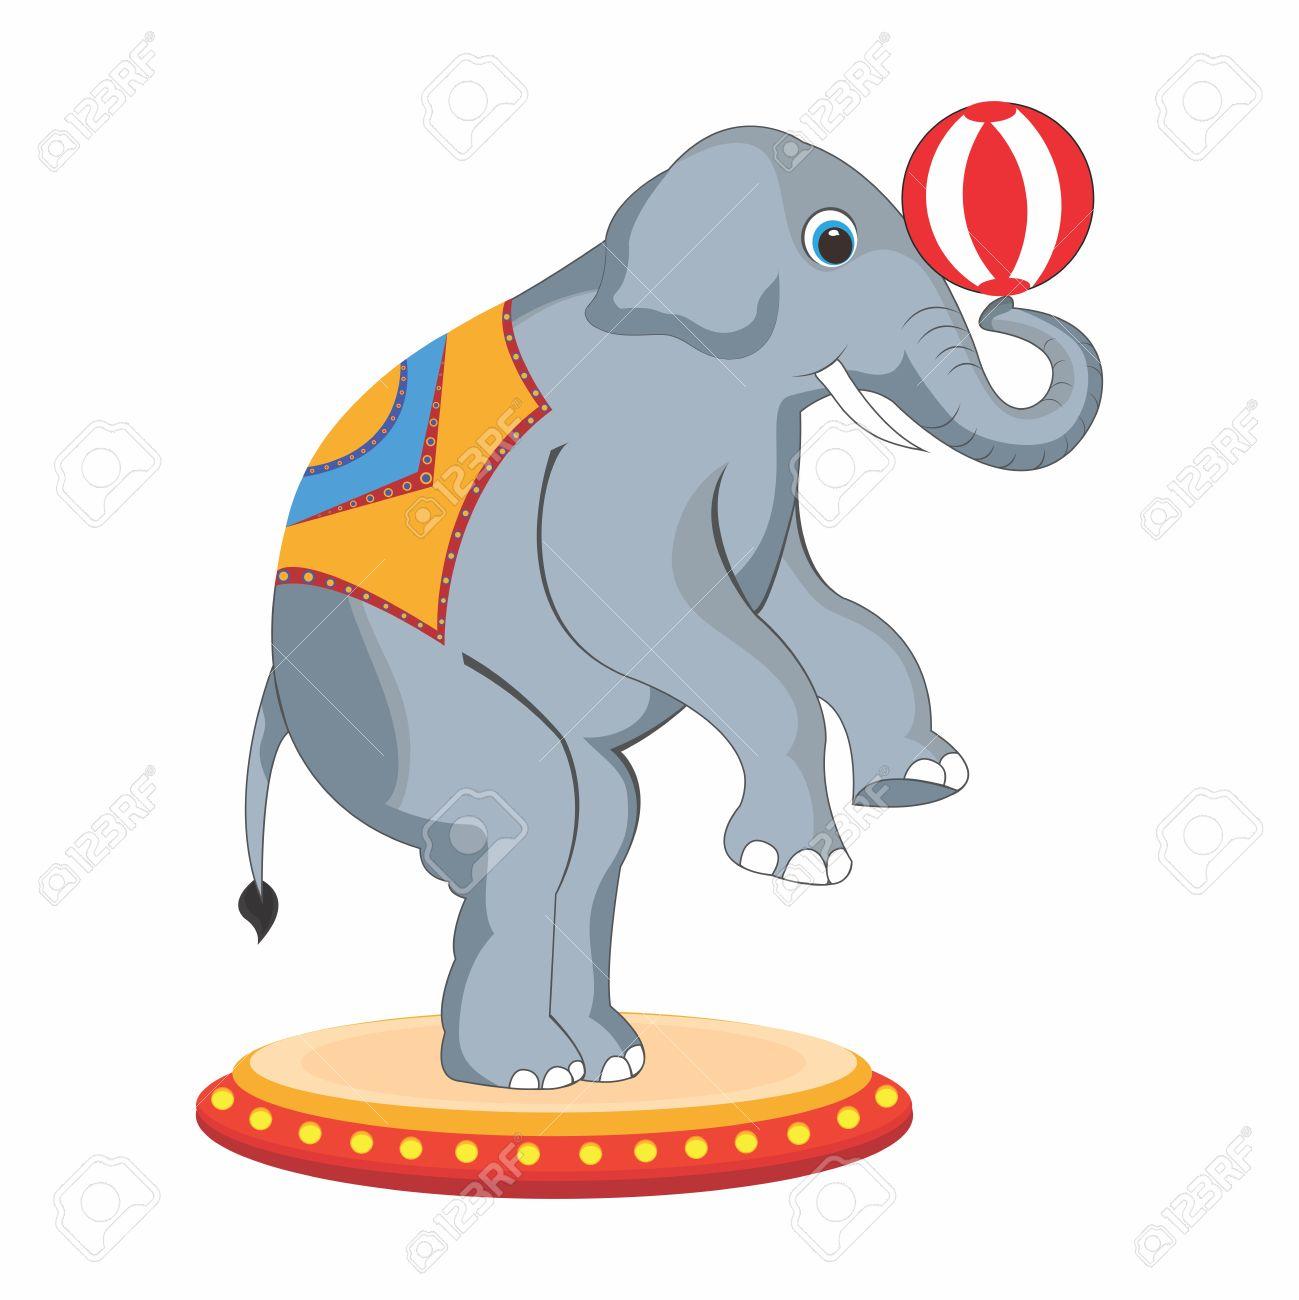 1299x1300 Vector Adorable Cartoon Circus Elephant Back Legs Standing